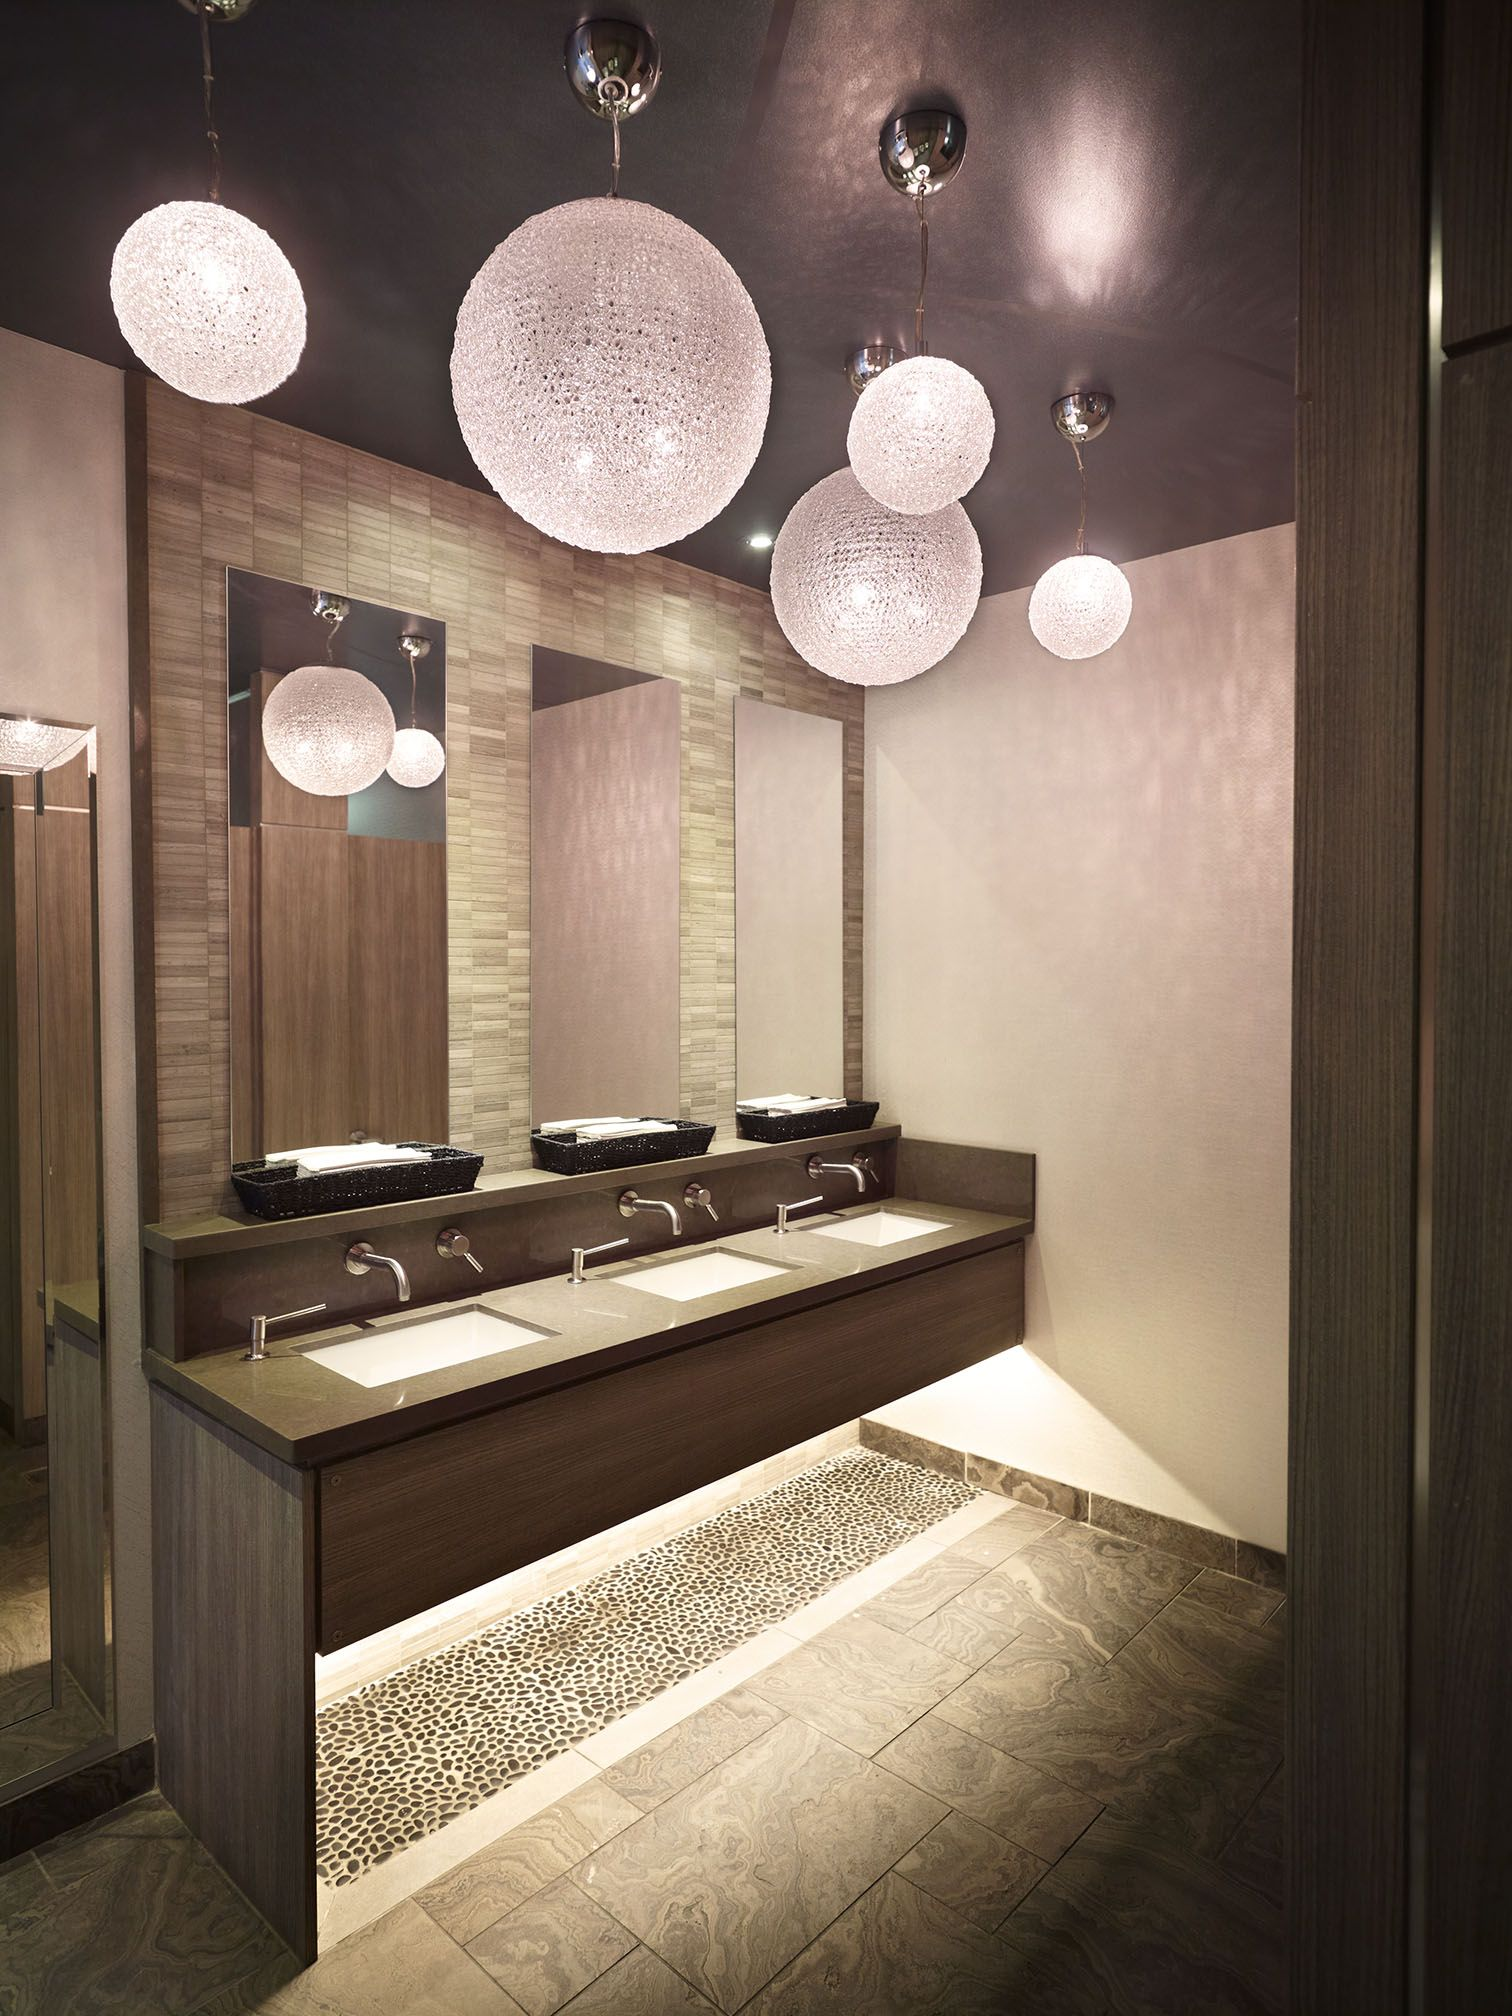 Best Color For Restaurant Bathroom